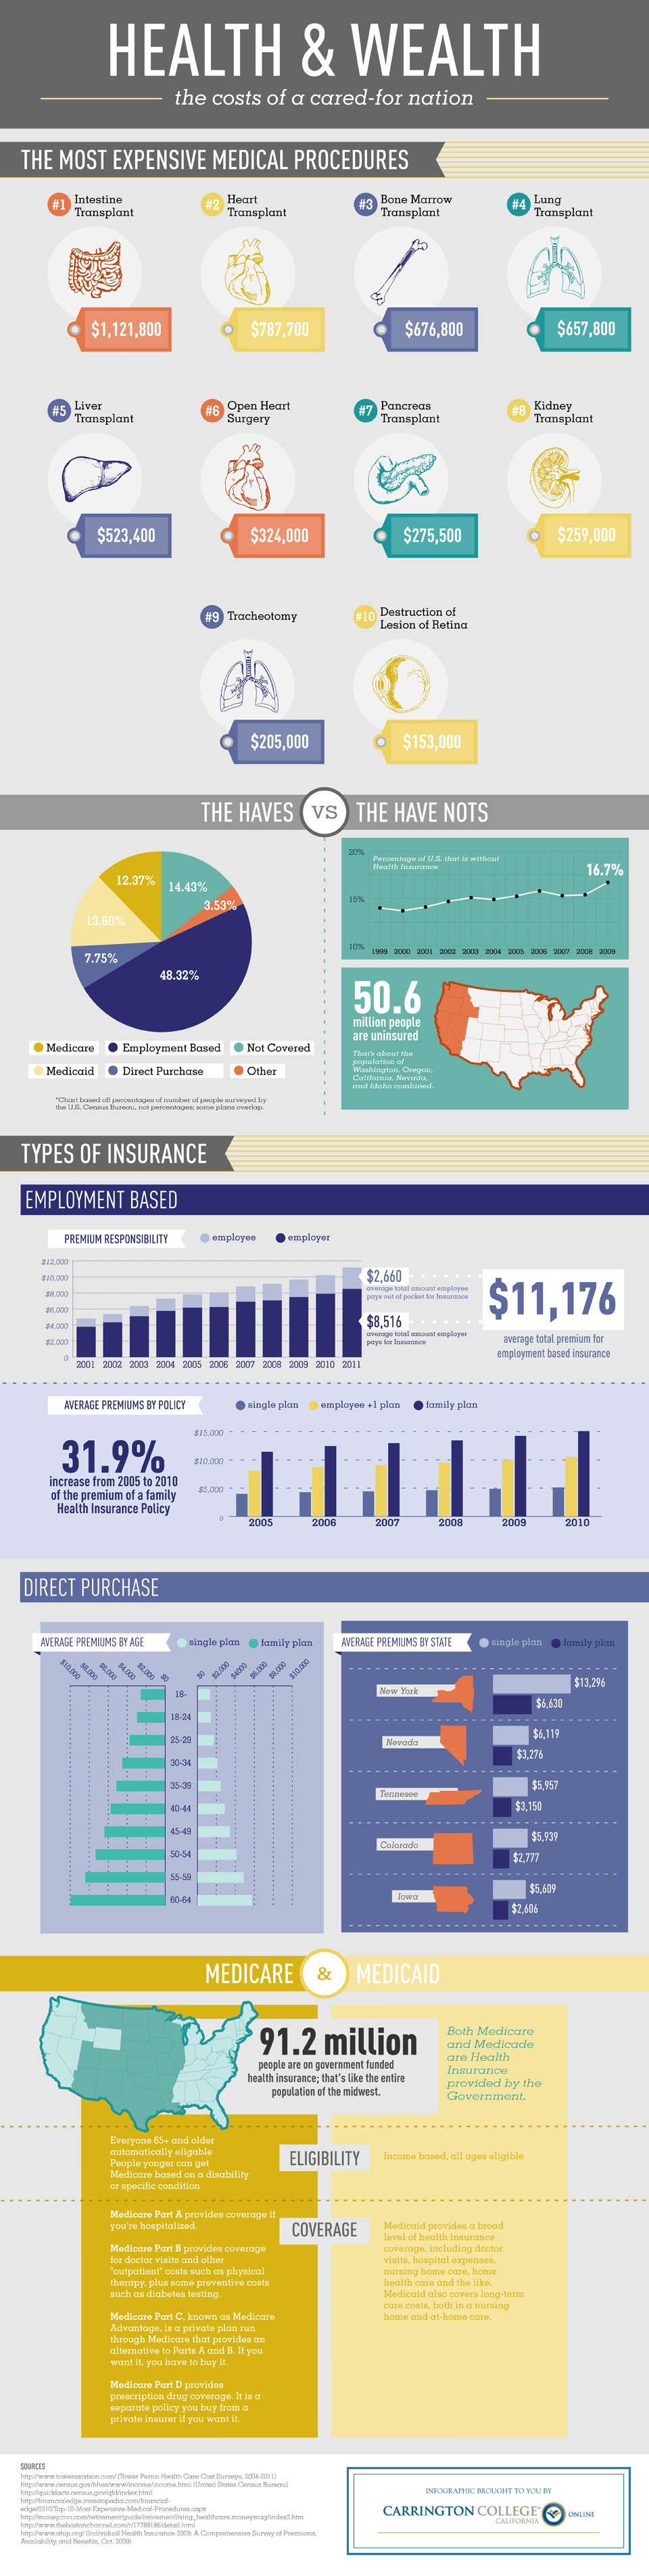 infografia-salud-y-riqueza-costes-de-salud